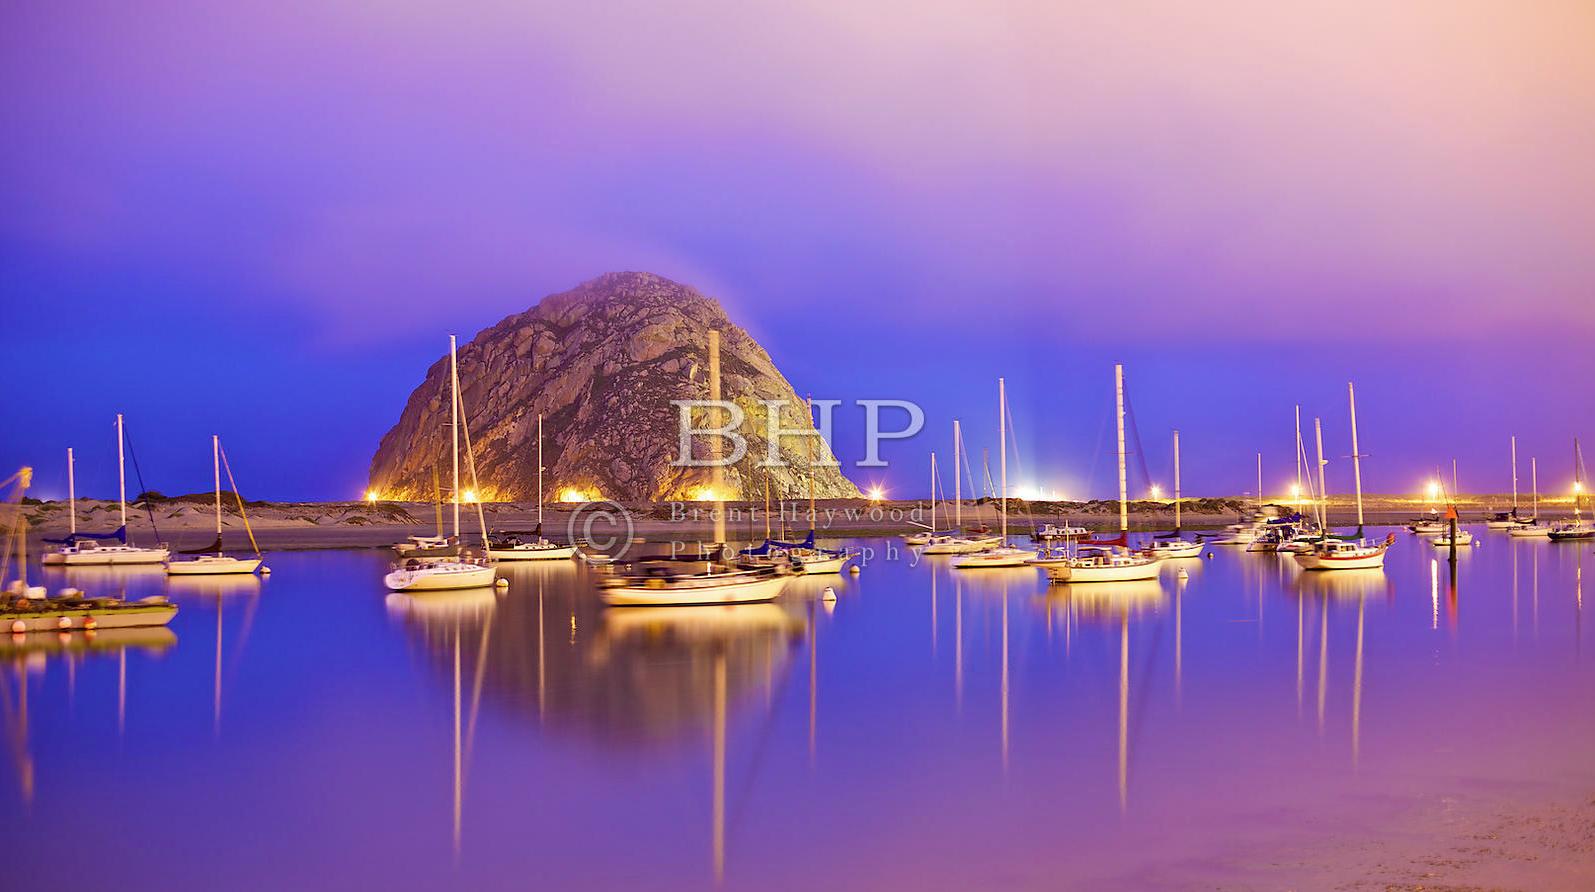 Morro Bay Rock Photo